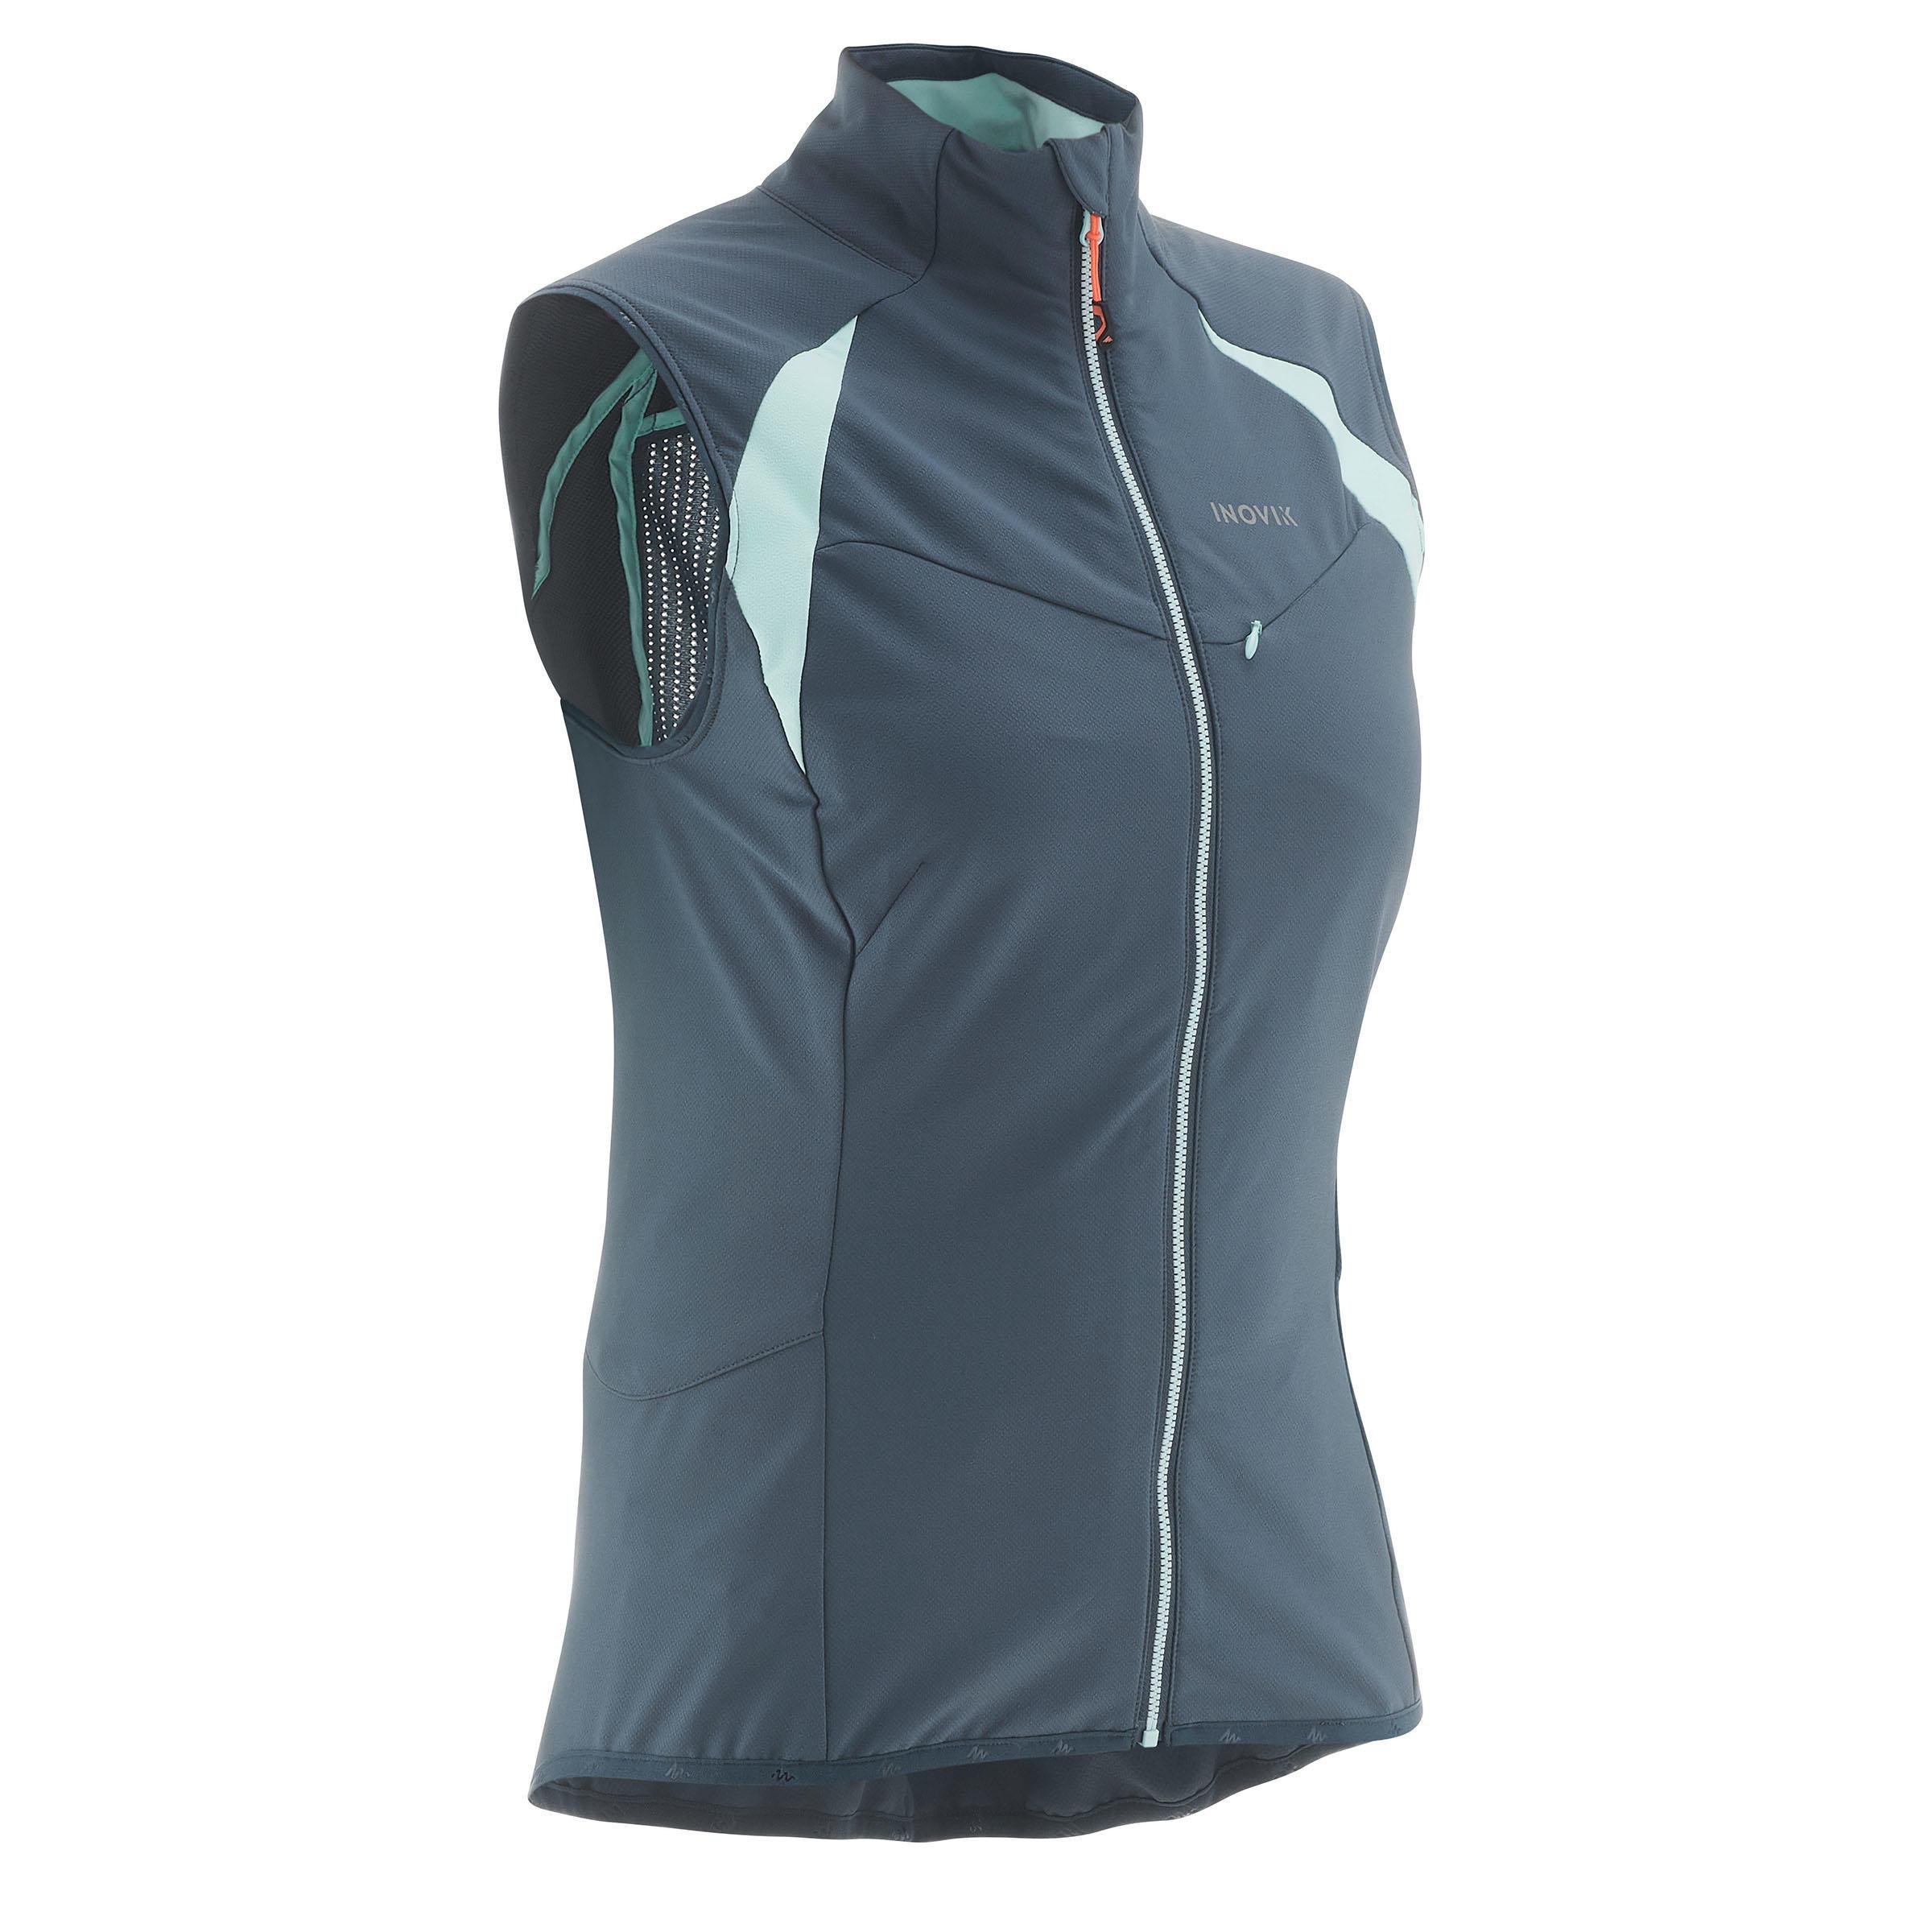 Inovik Mouwloos damesvest XC S Vest 500 grijs/blauw thumbnail